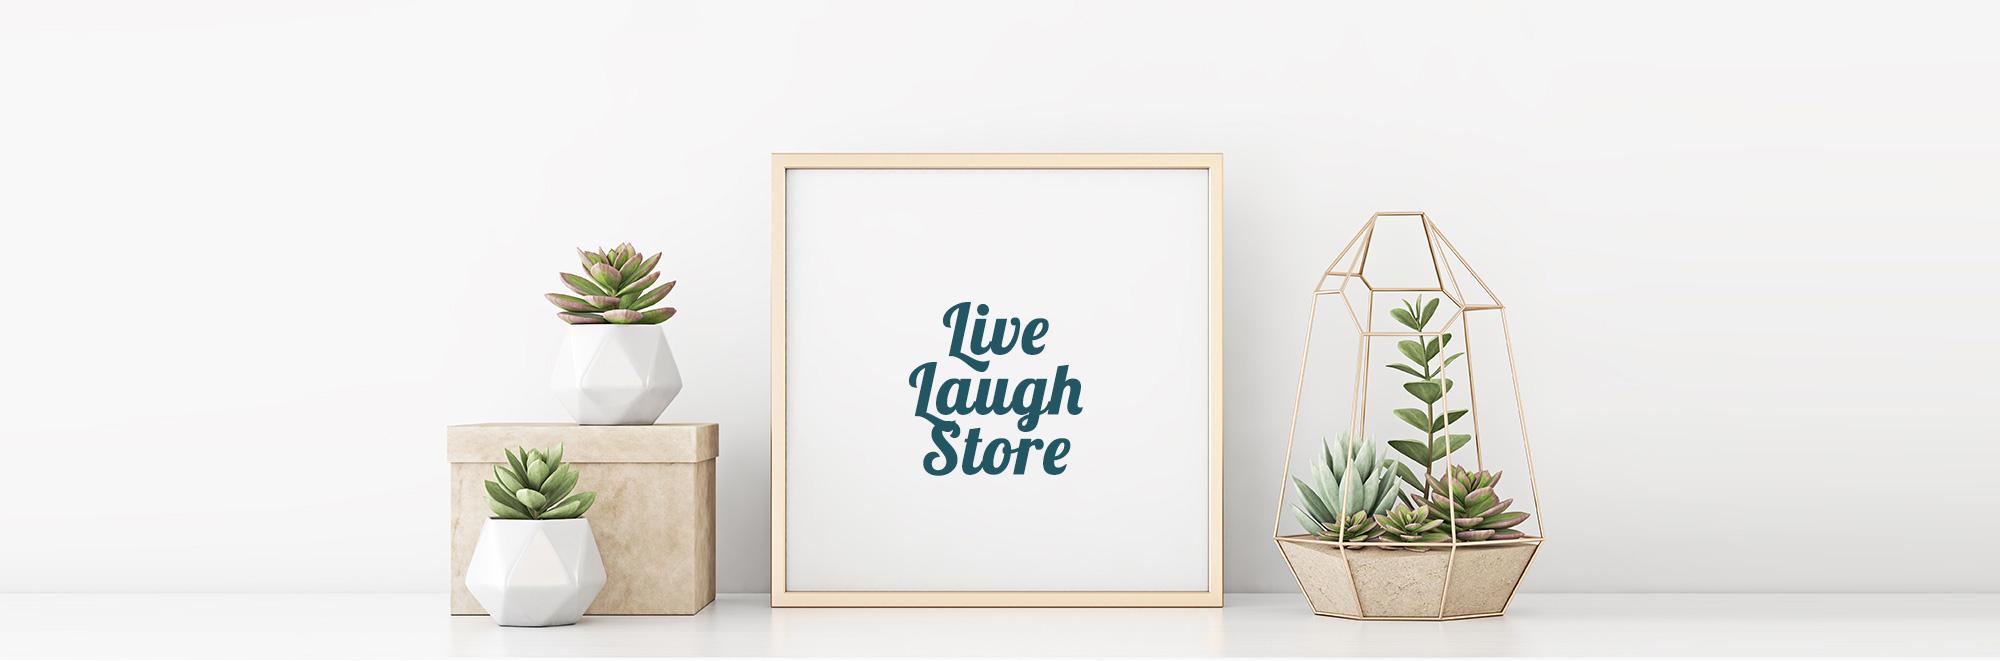 Live, laugh store